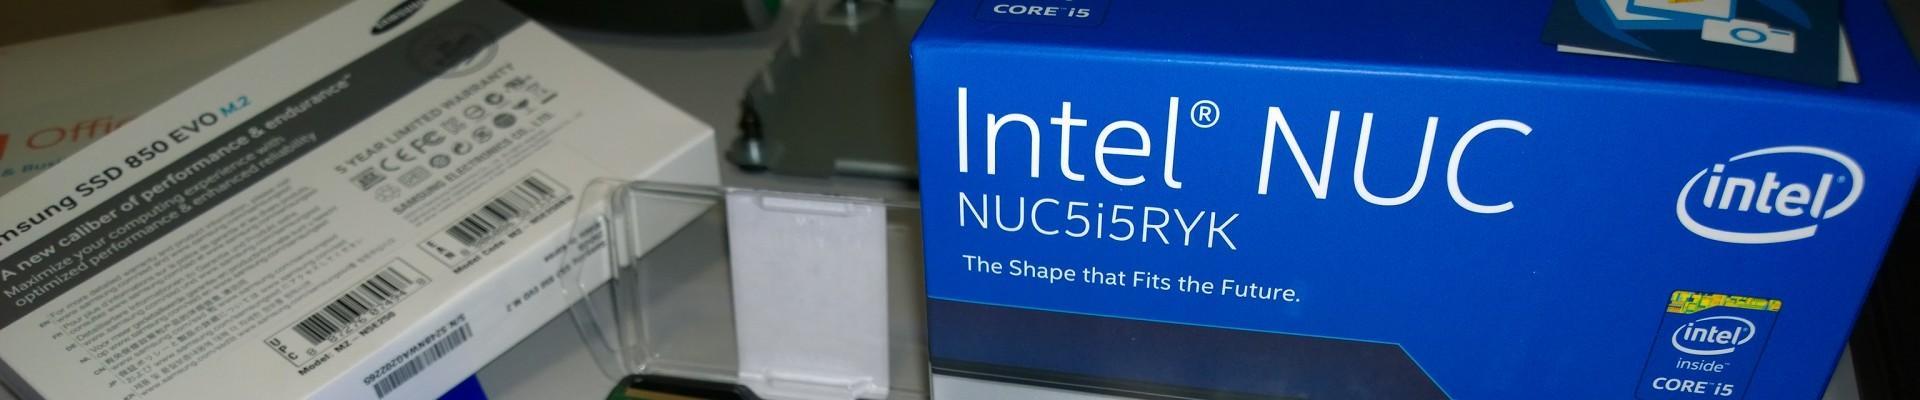 NAR Design Intel NUC build